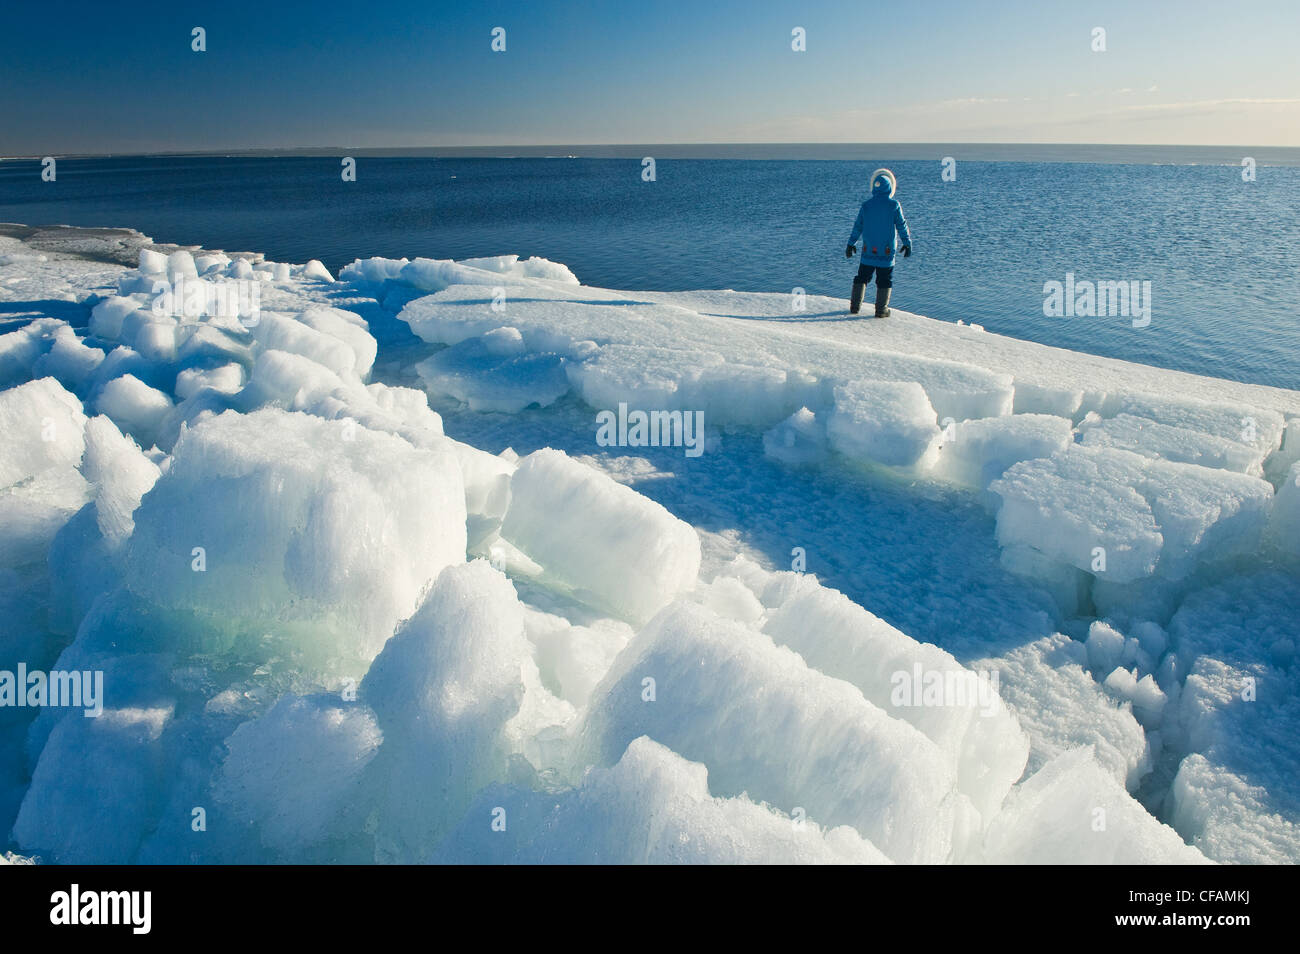 a man looks out over melting ice, along Lake Winnipeg, Manitoba, Canada - Stock Image